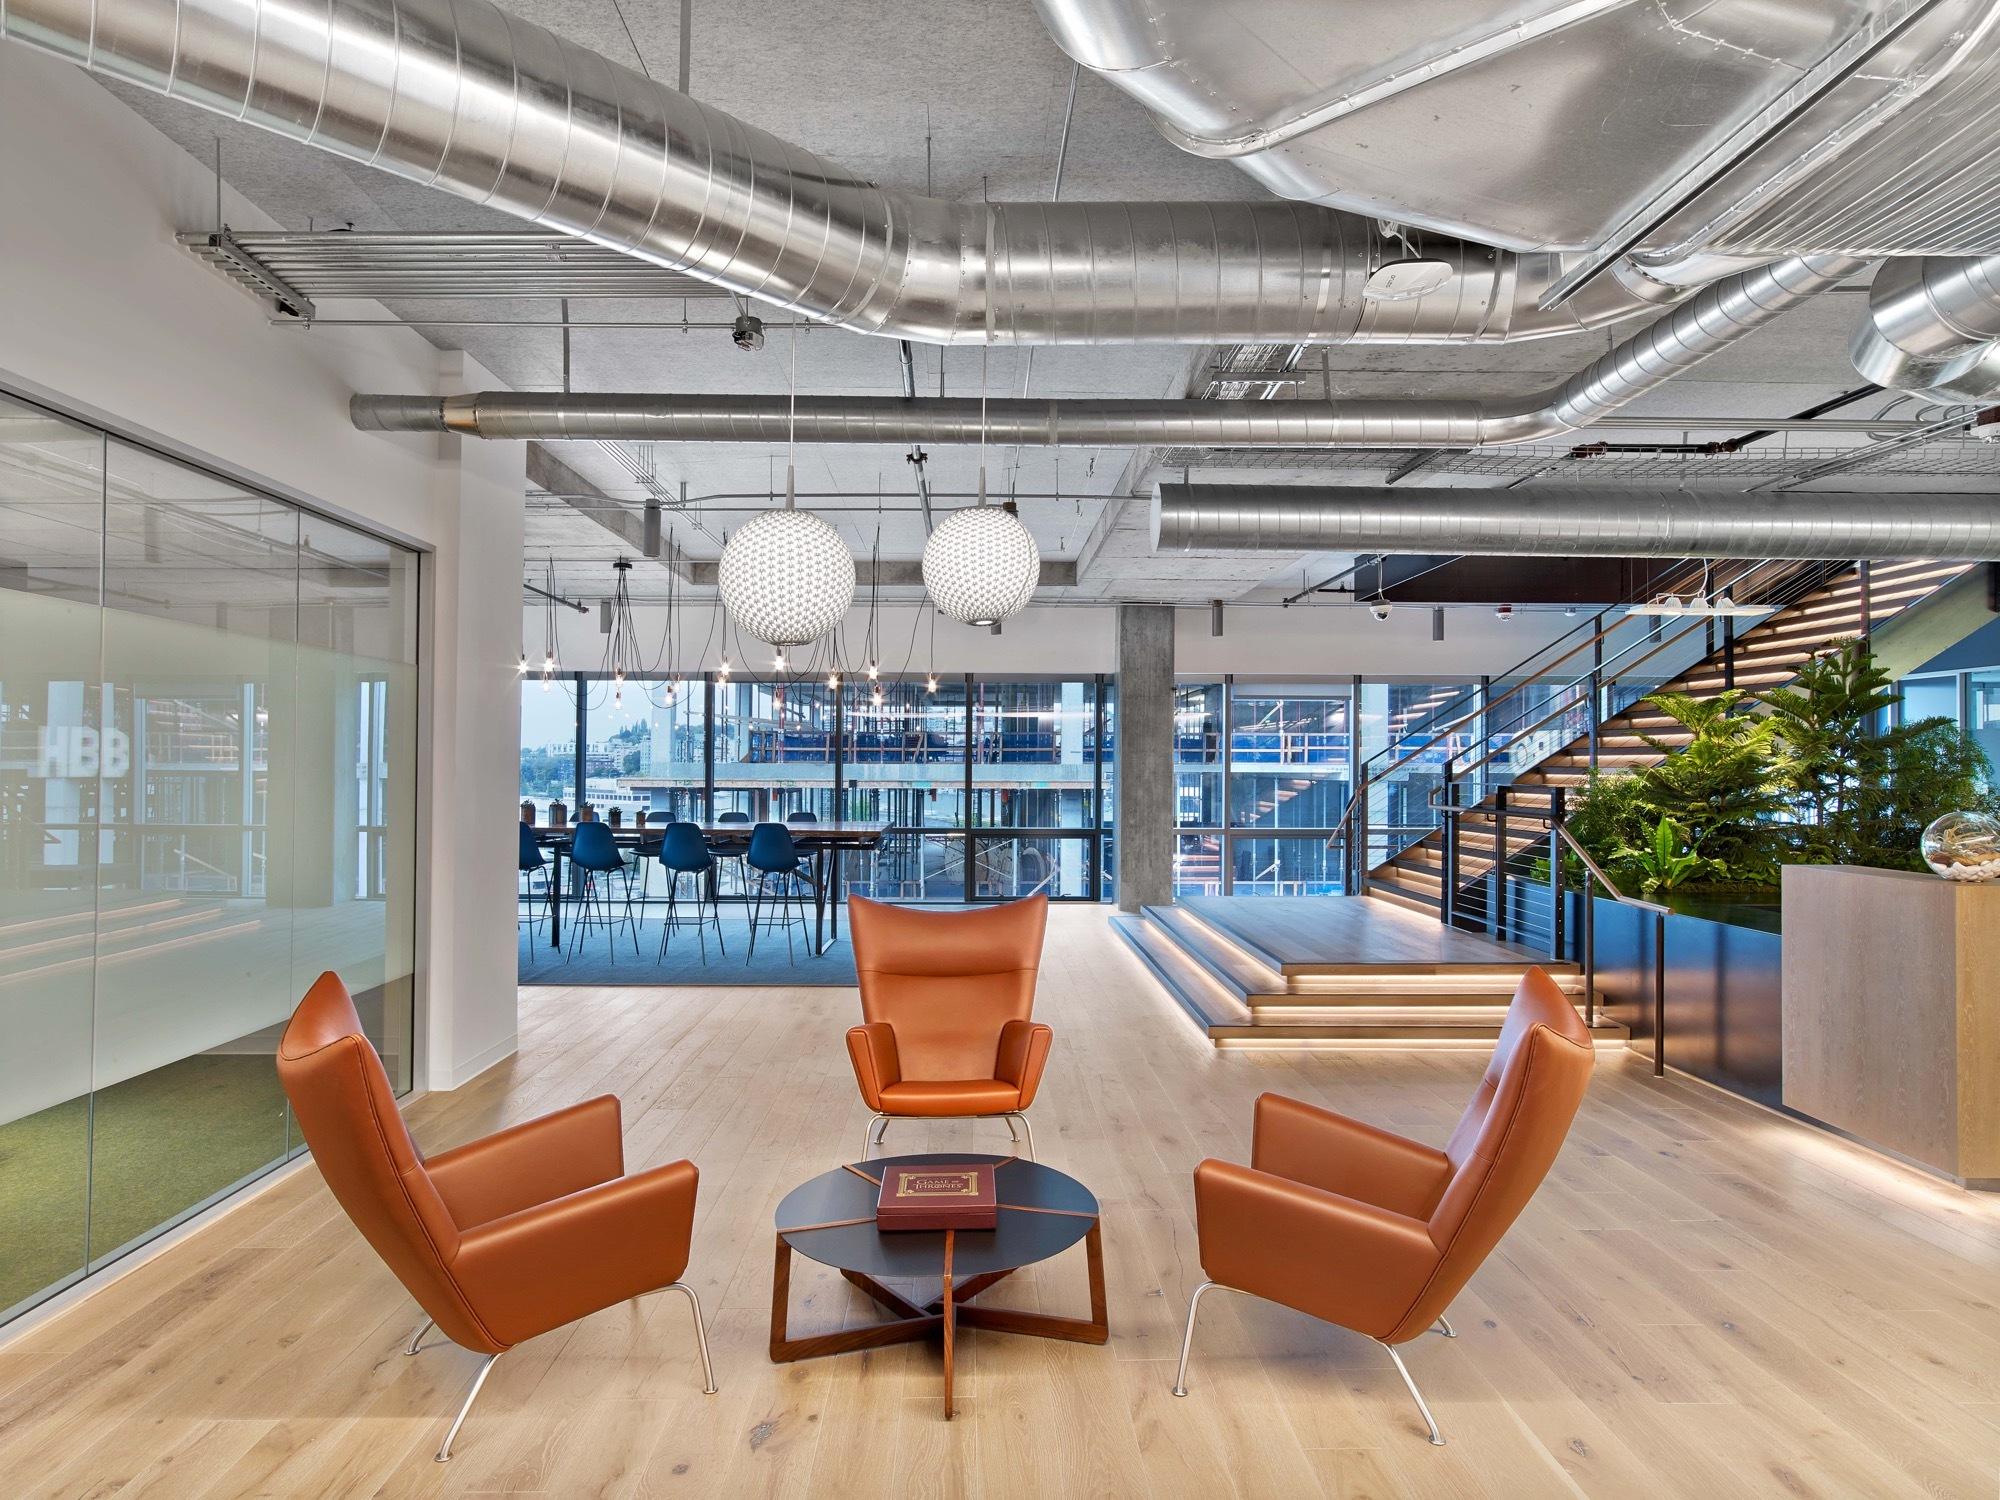 Hbo Seattle Workspace Rapt Studio - 2